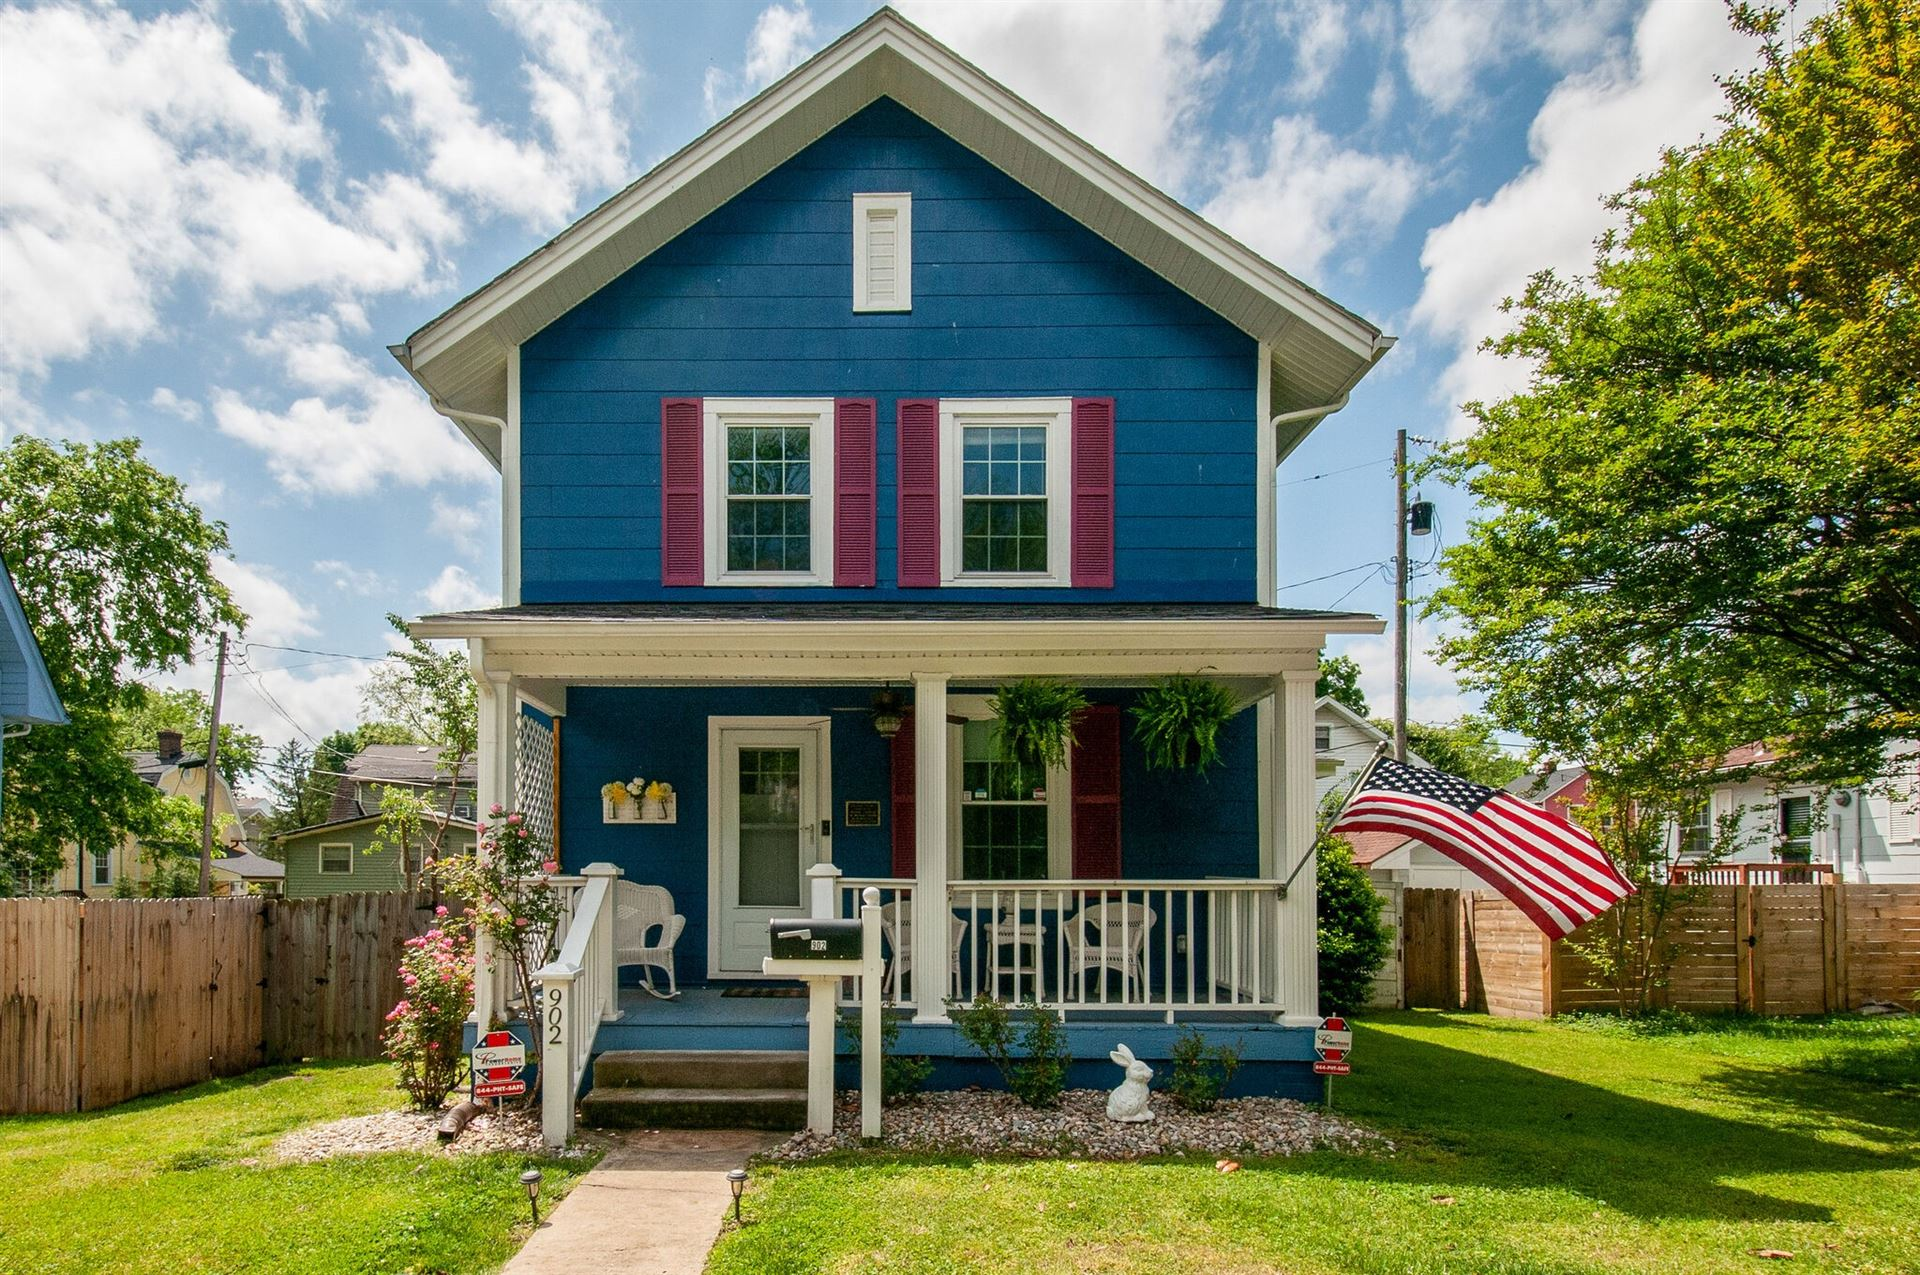 902 Jones St, Old Hickory, TN 37138 - MLS#: 2250611